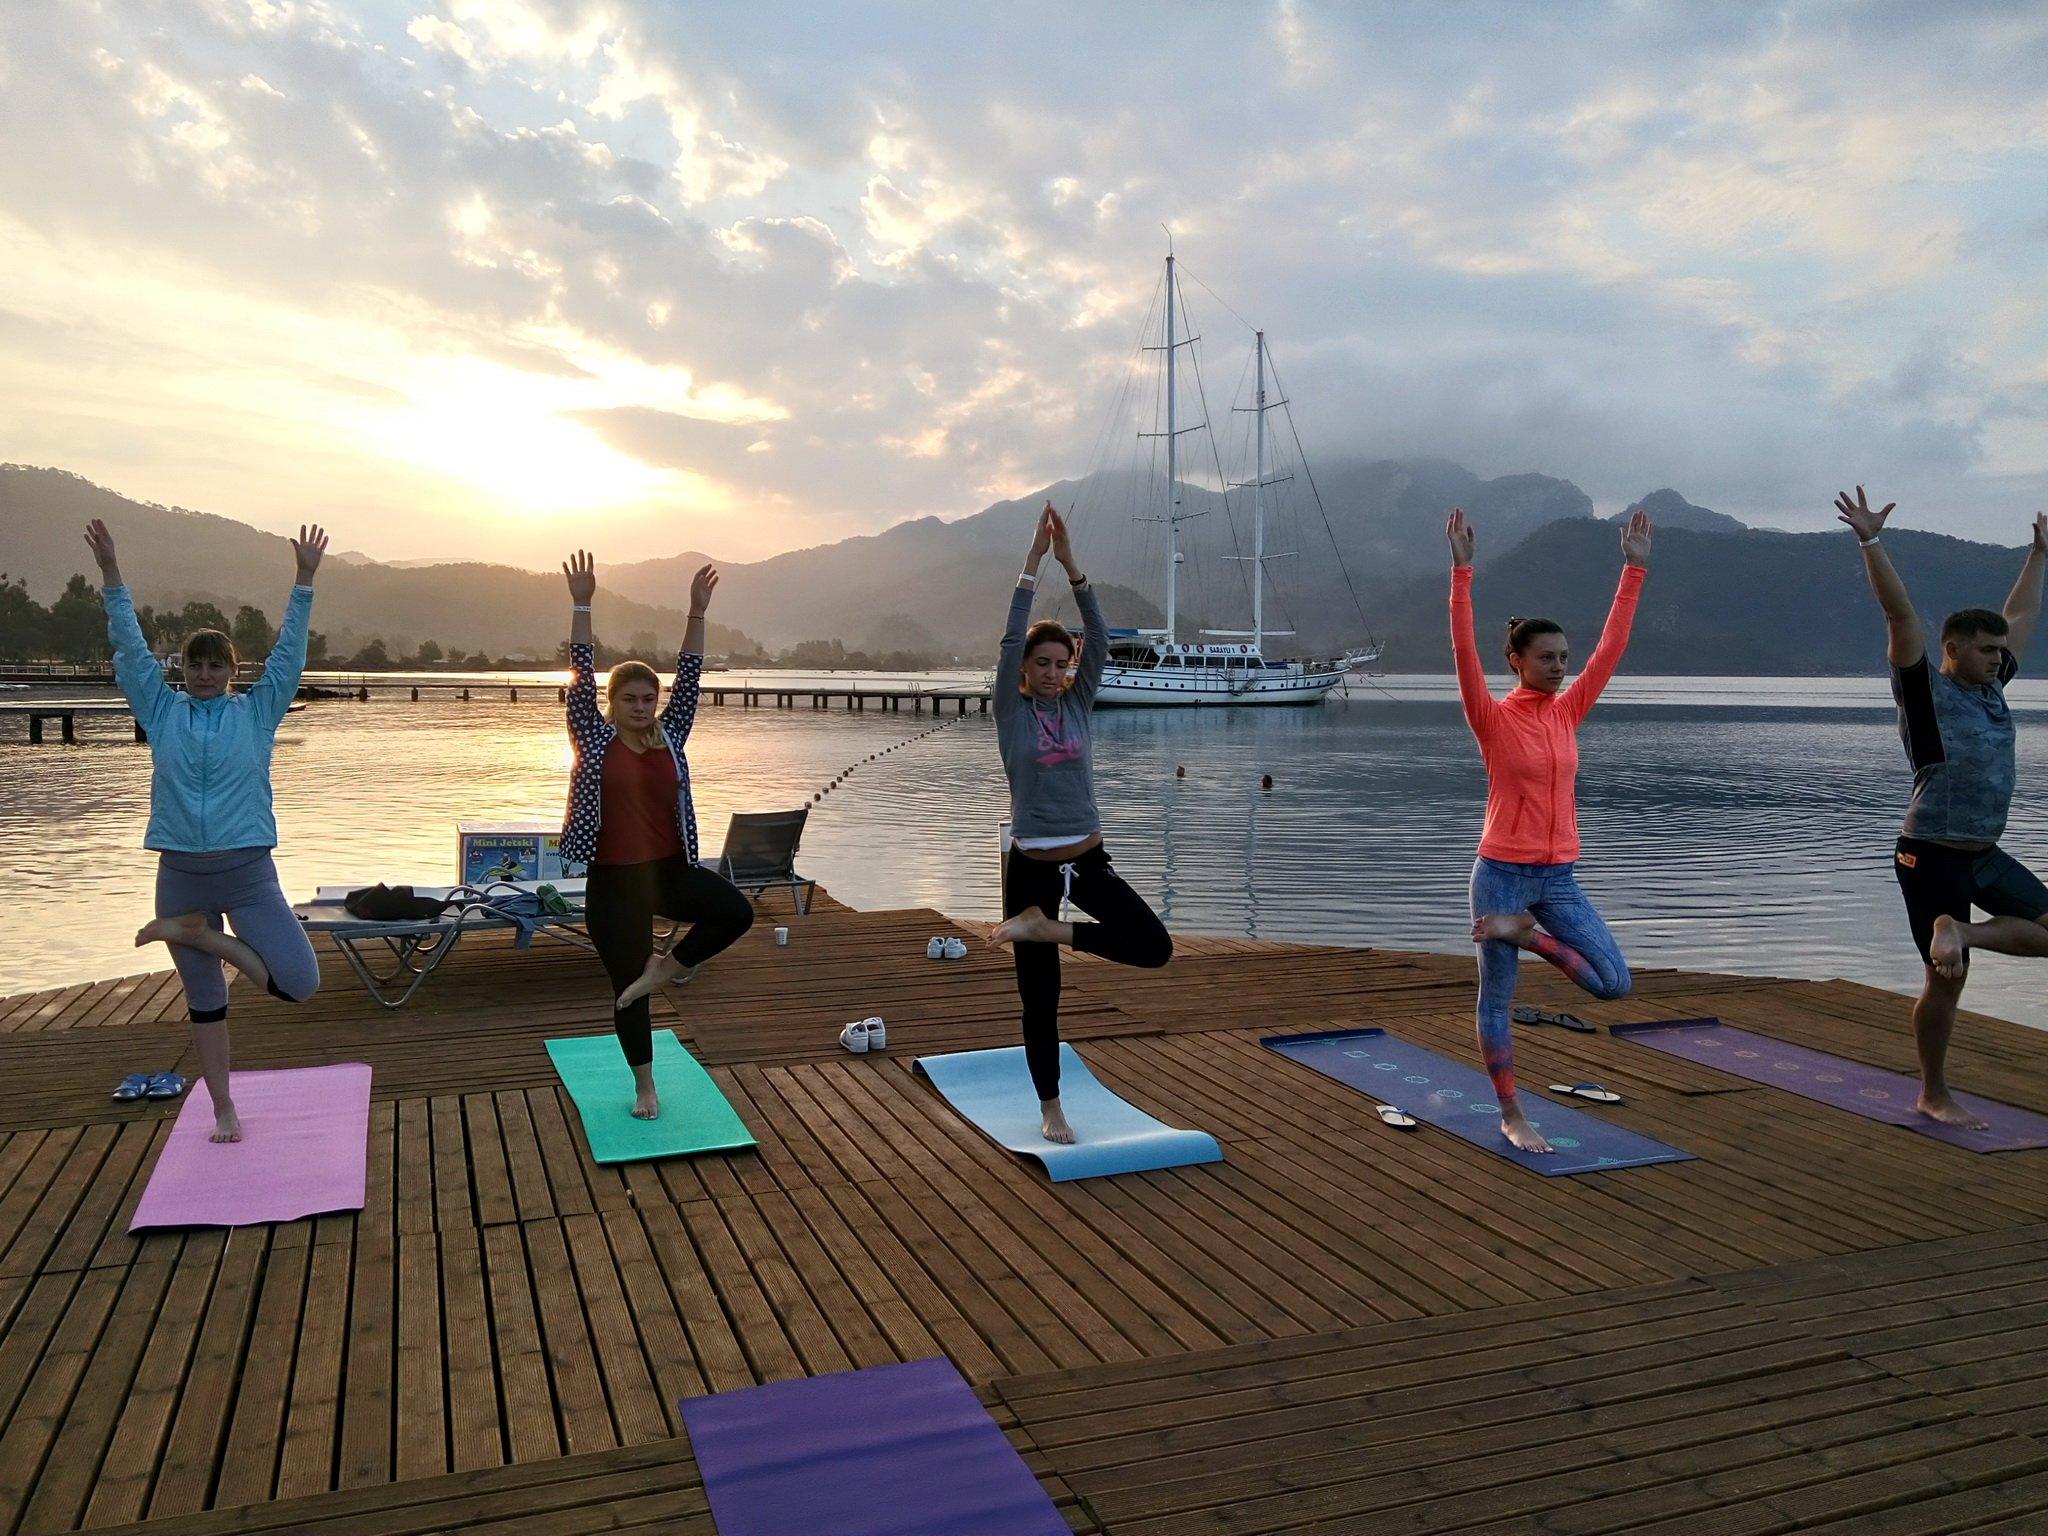 Весенний йога семинар 2018 — Айя Напа, Кипр